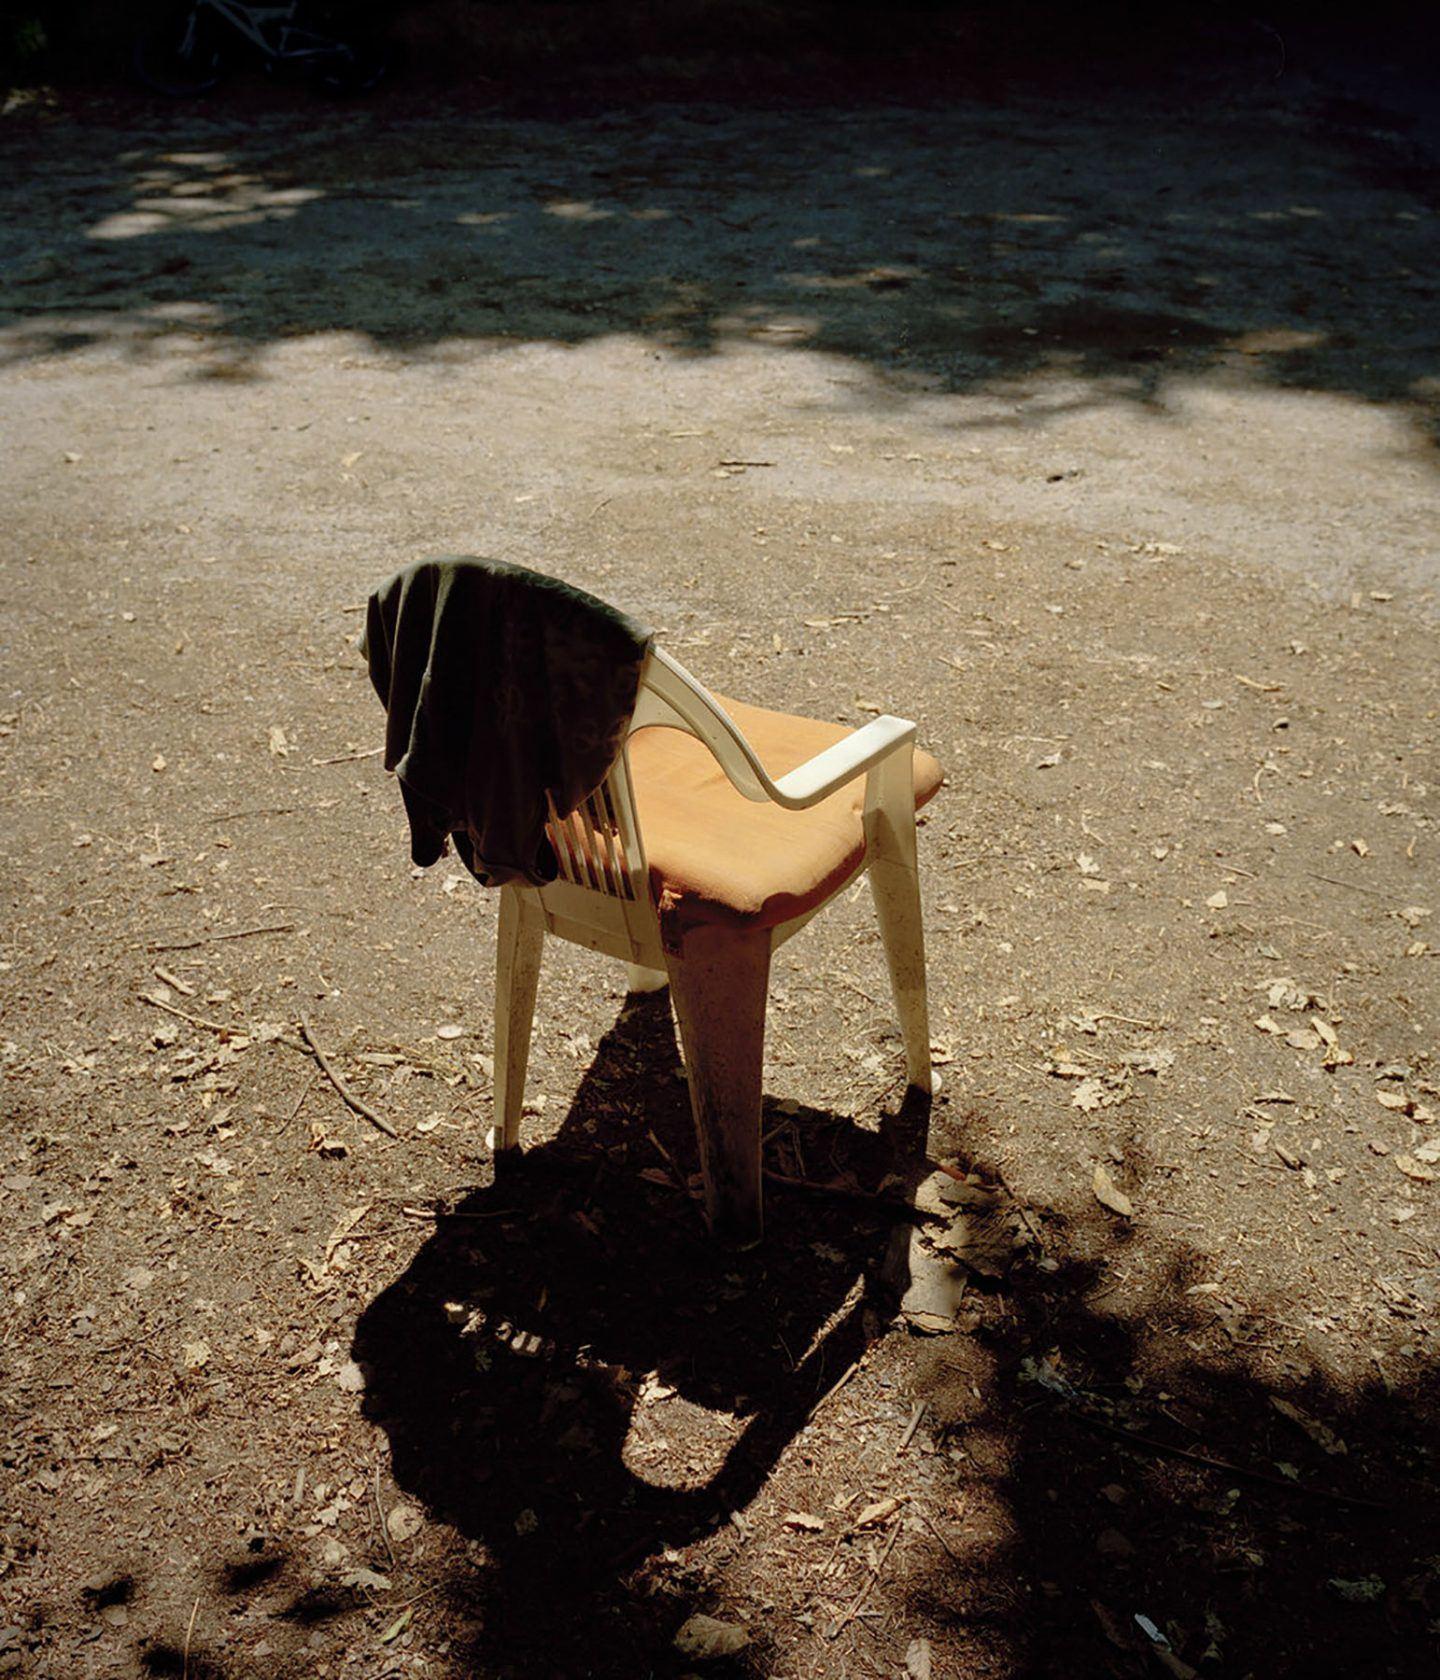 IGNANT-Photography-Ben-Terzza-28